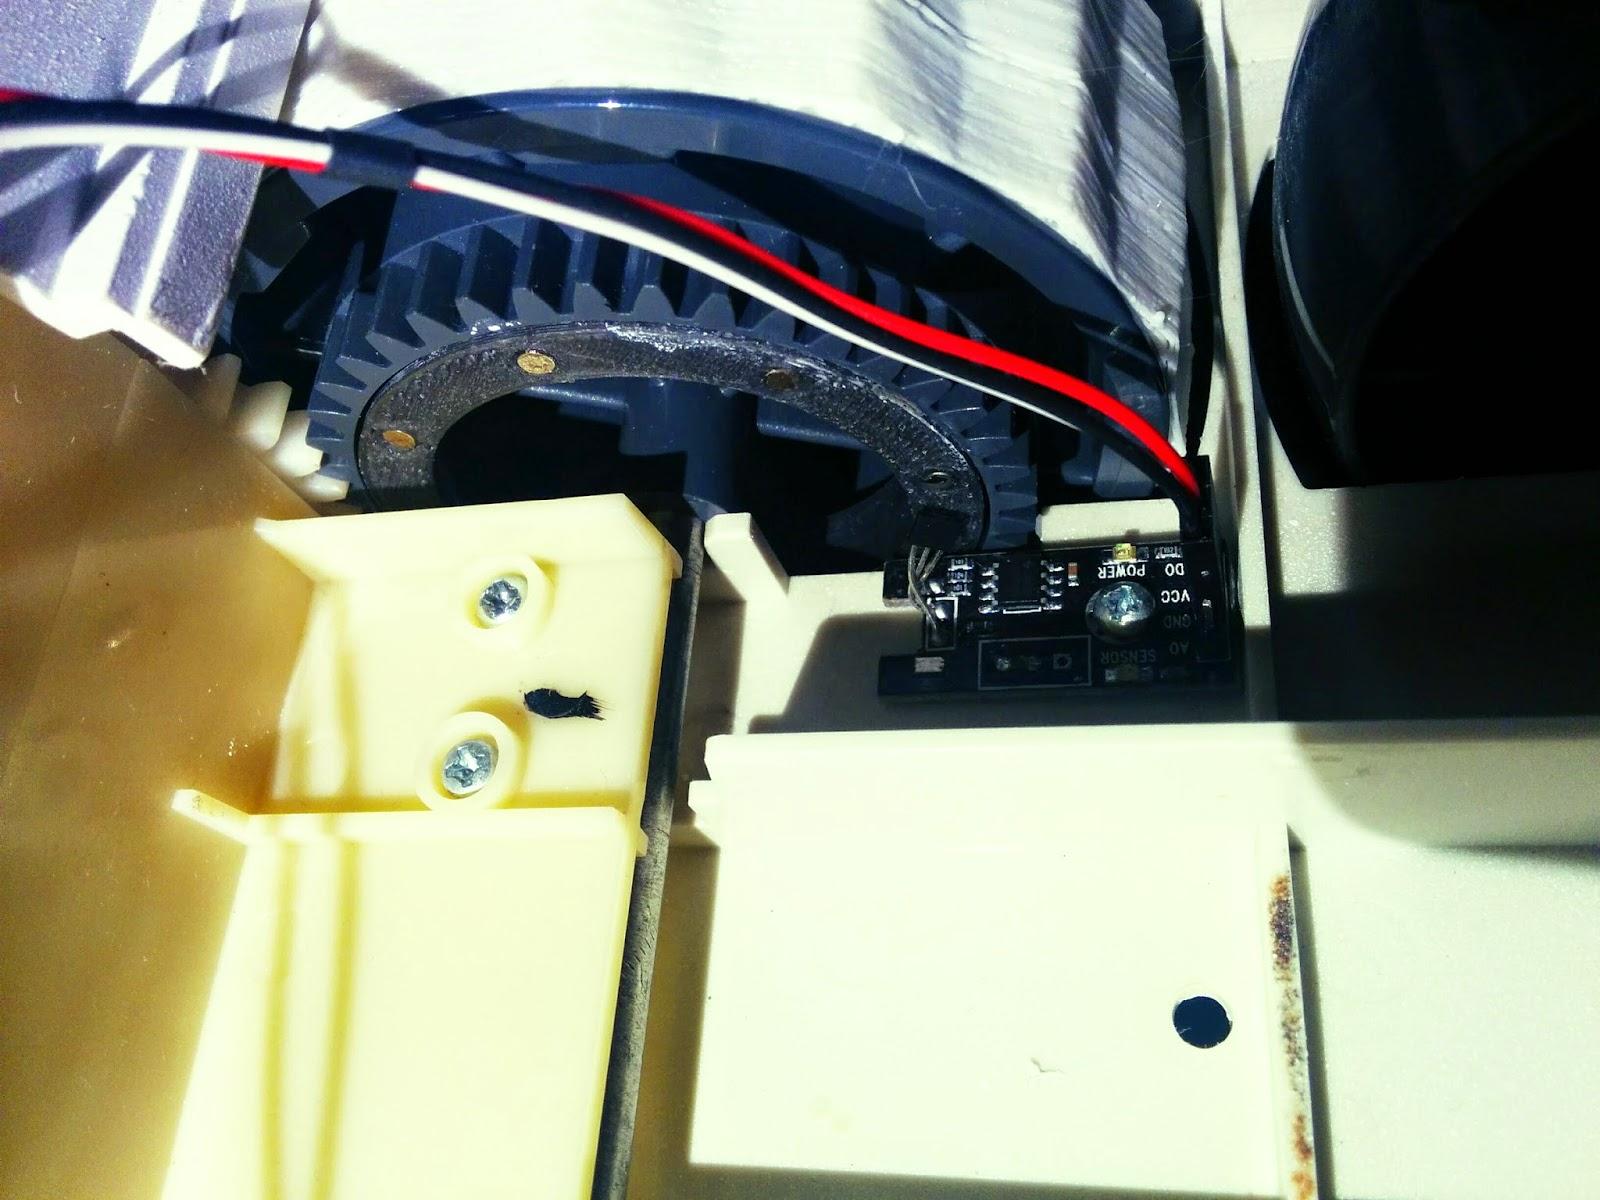 Blue Smoke Robot 2015 Servo Wiring Diagram Http Wwwezrobotcom Community Forum Posts Magnetic Wheel Encoder 8 Steps At 45 Degree Increments